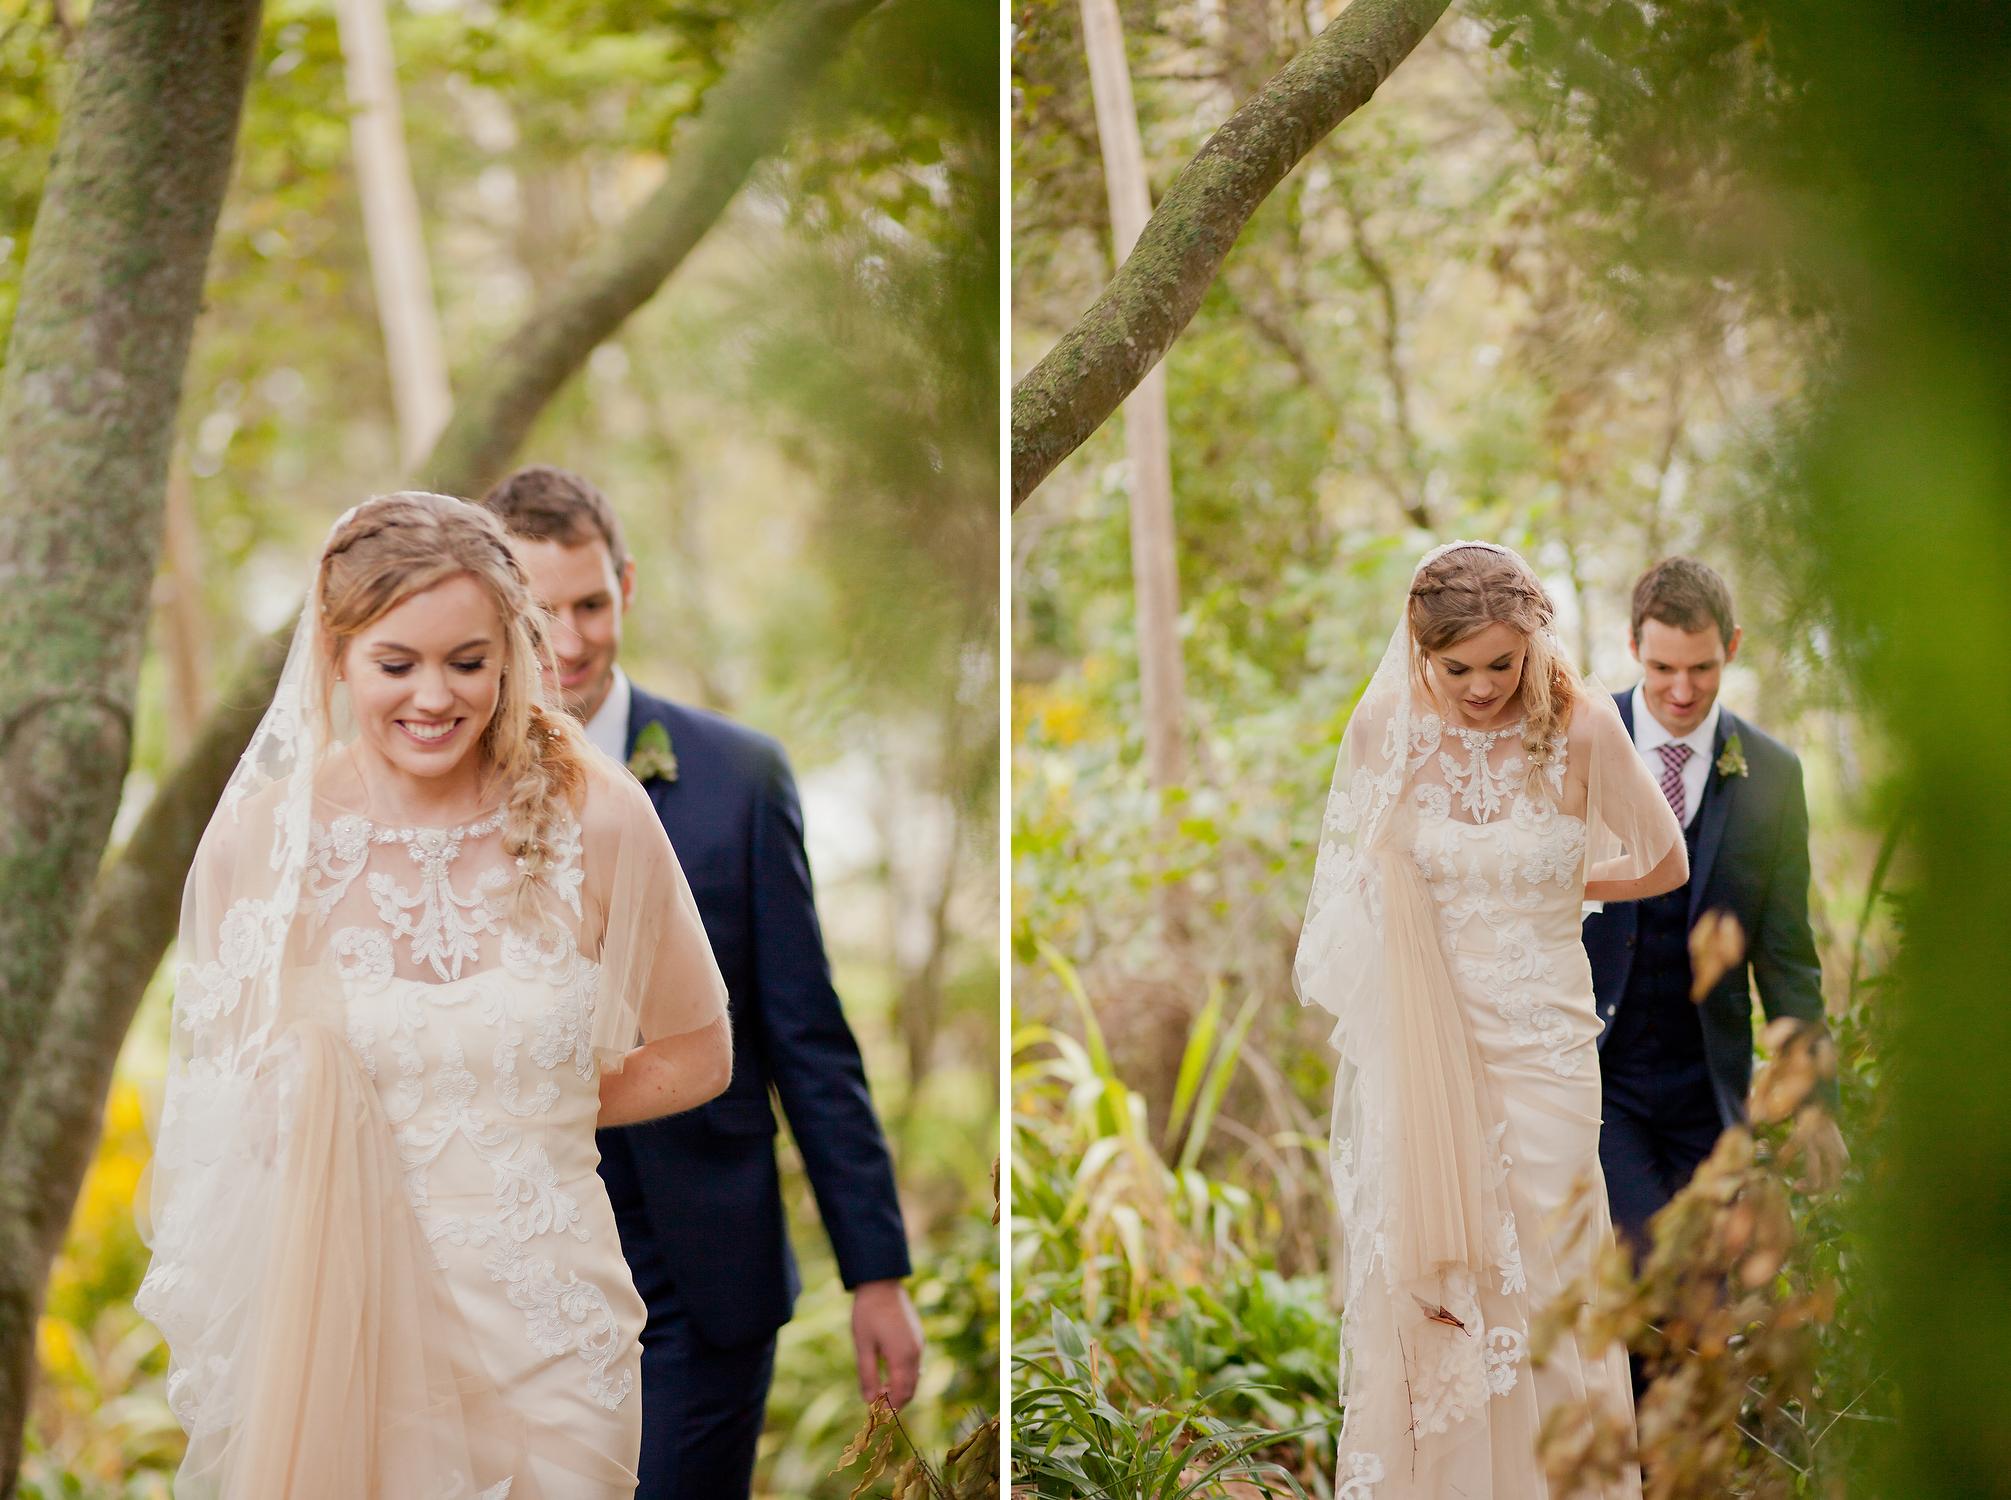 wellington wedding photography NZ - 1433.JPG